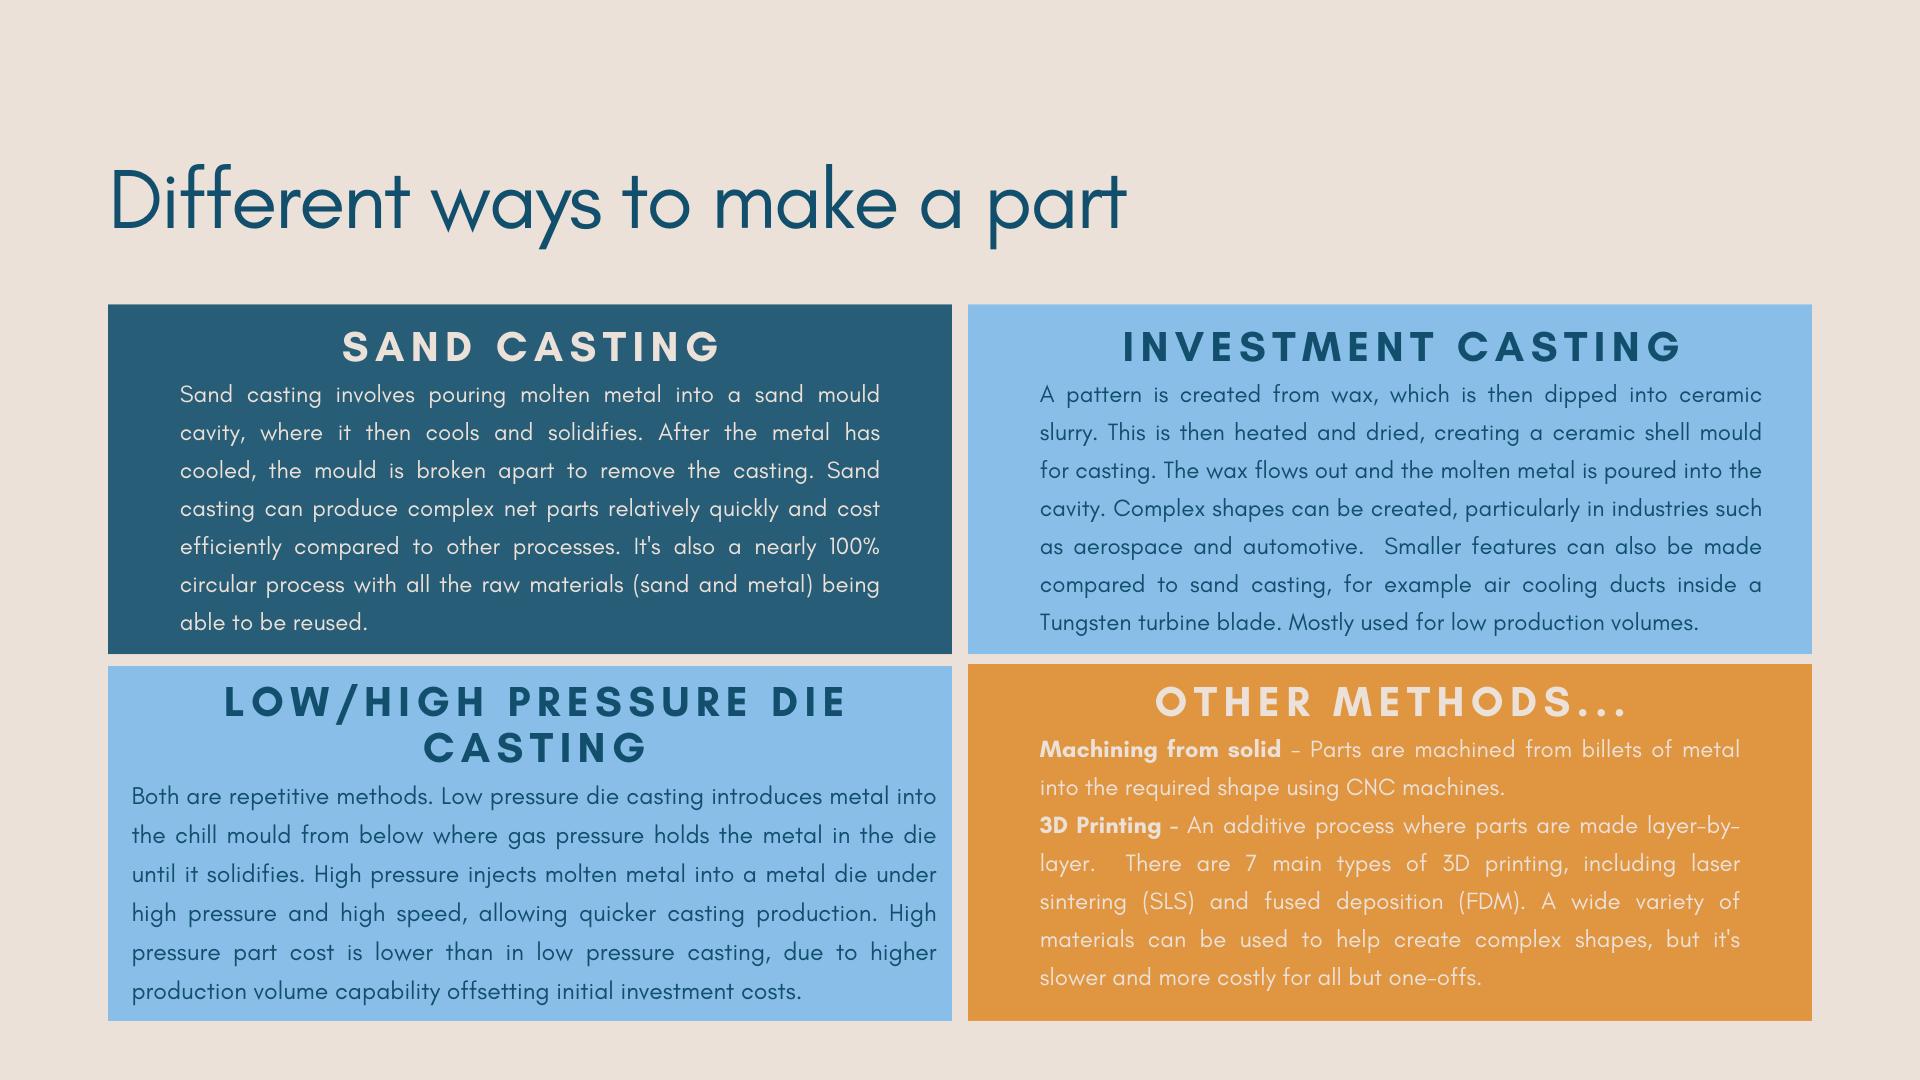 Different casting methods